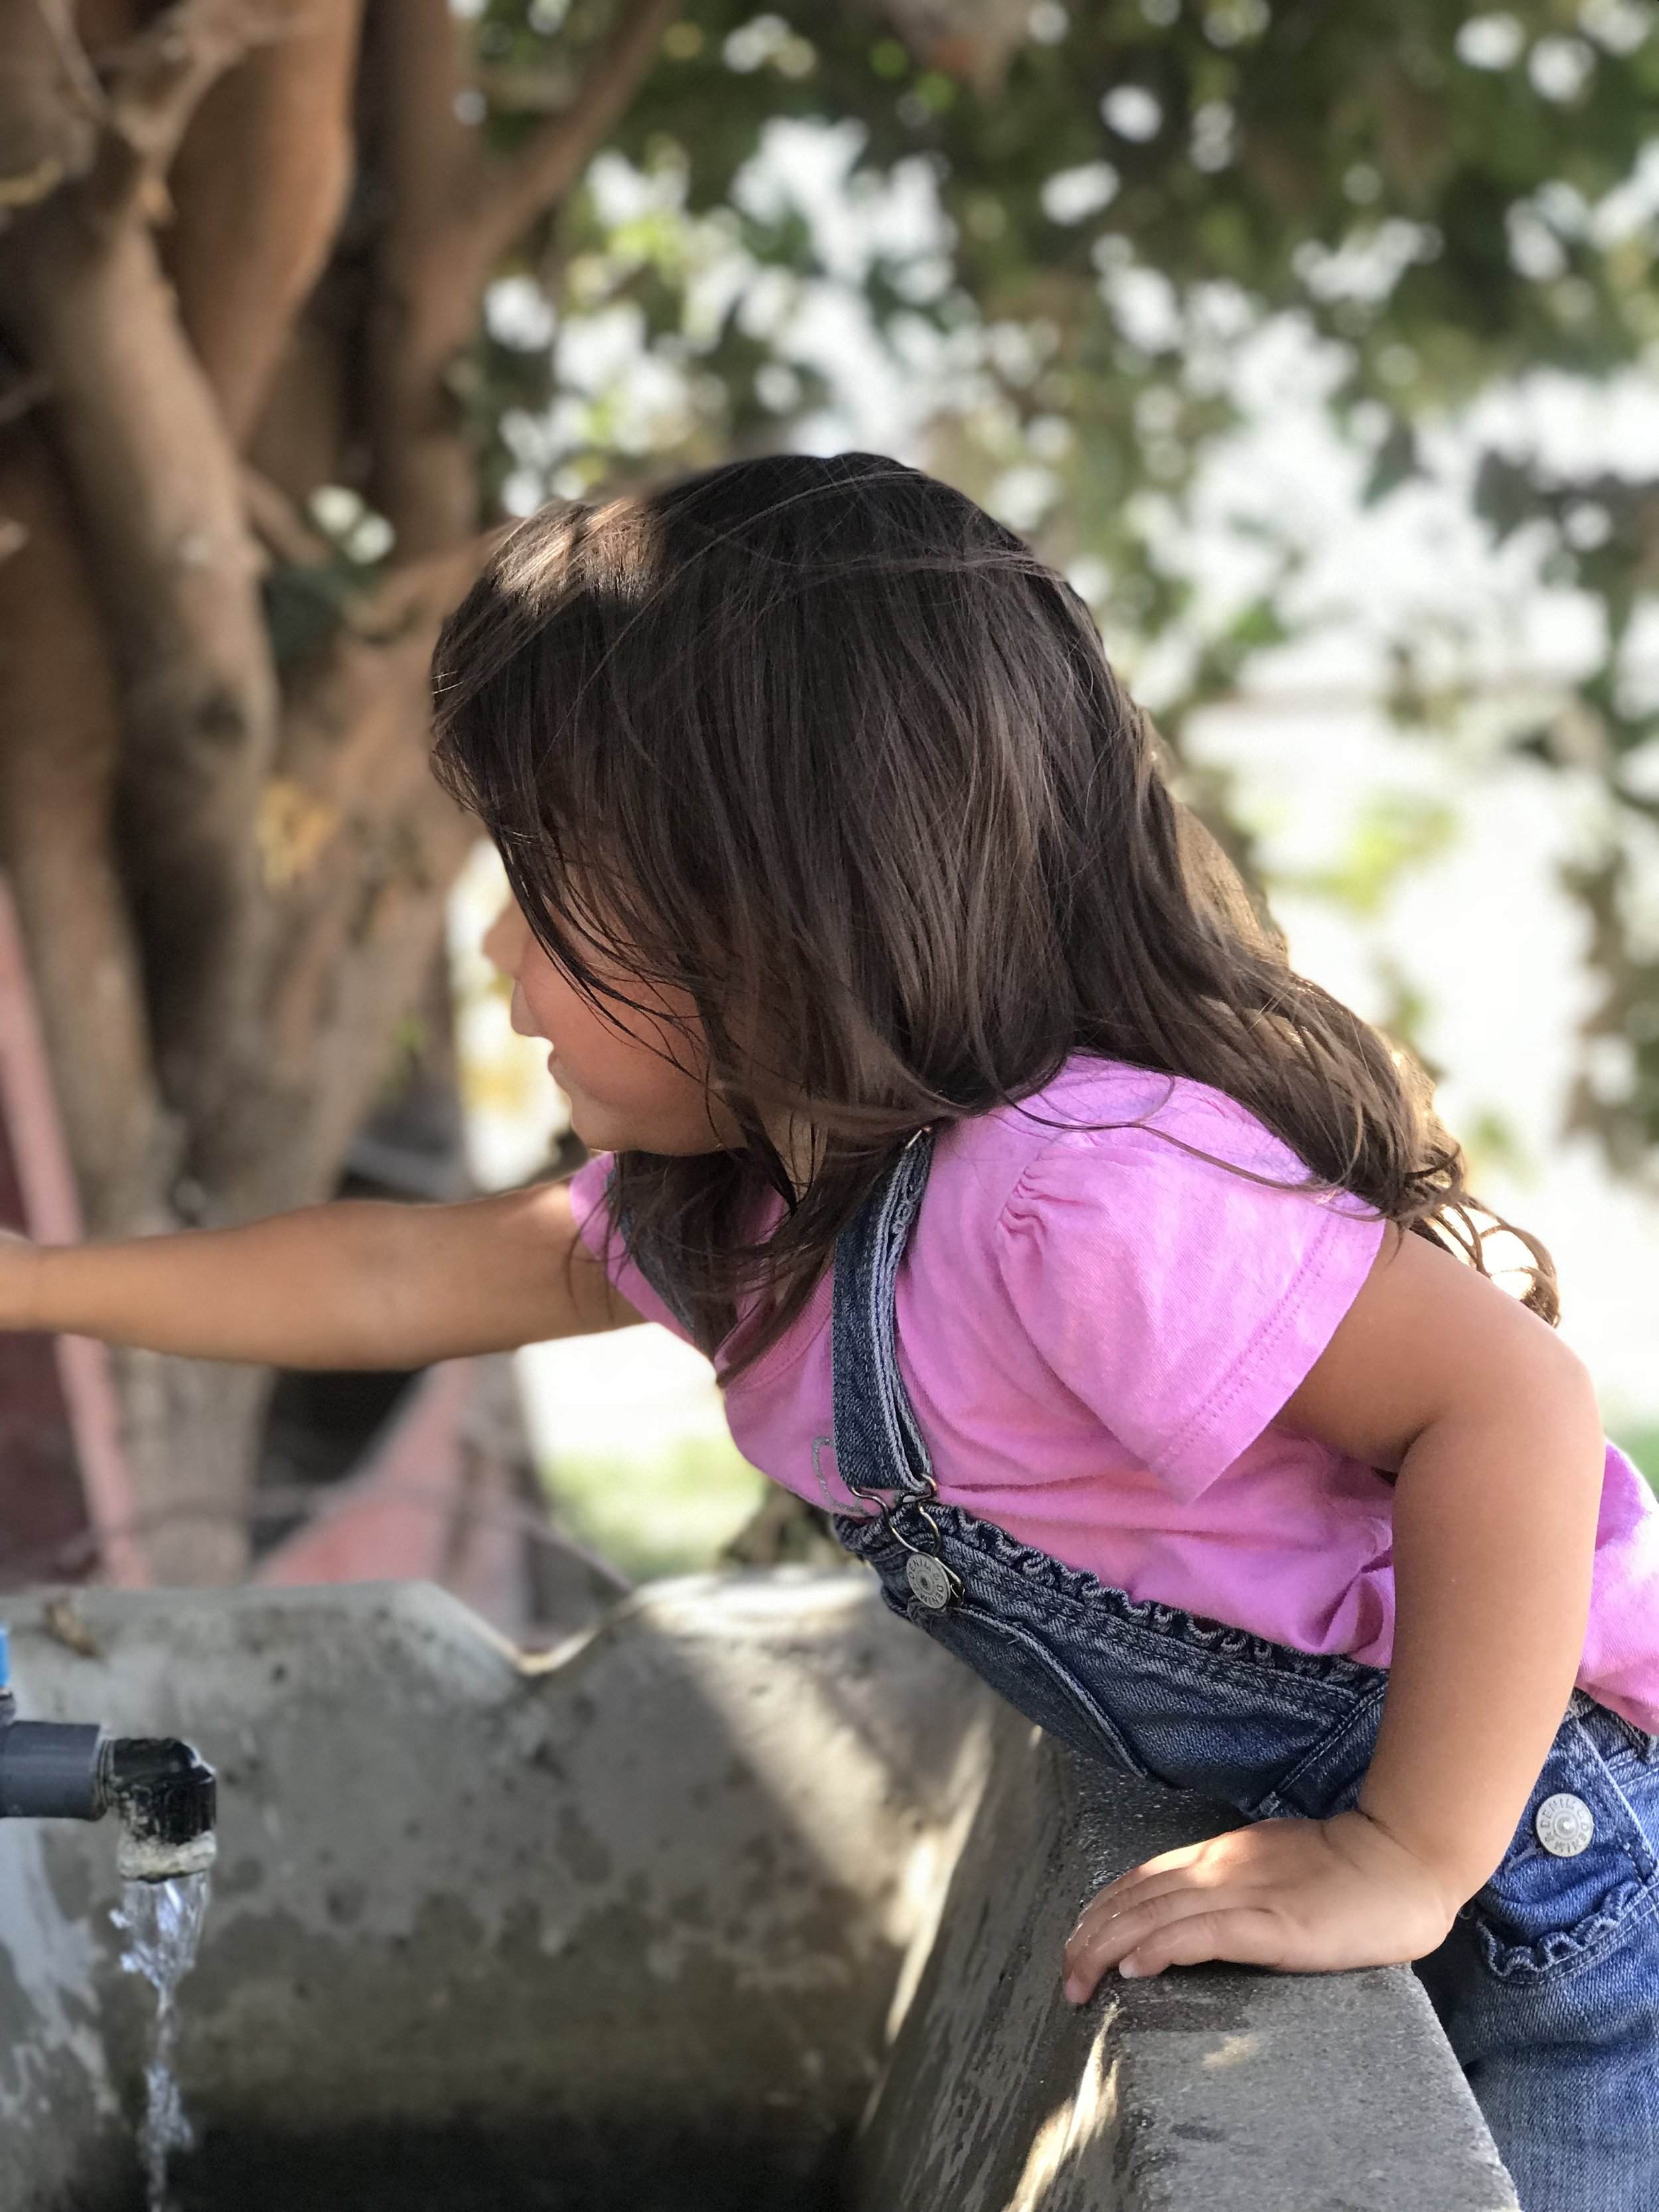 FARM TRIP WITH HOMESCHOOL KIDS.jpg